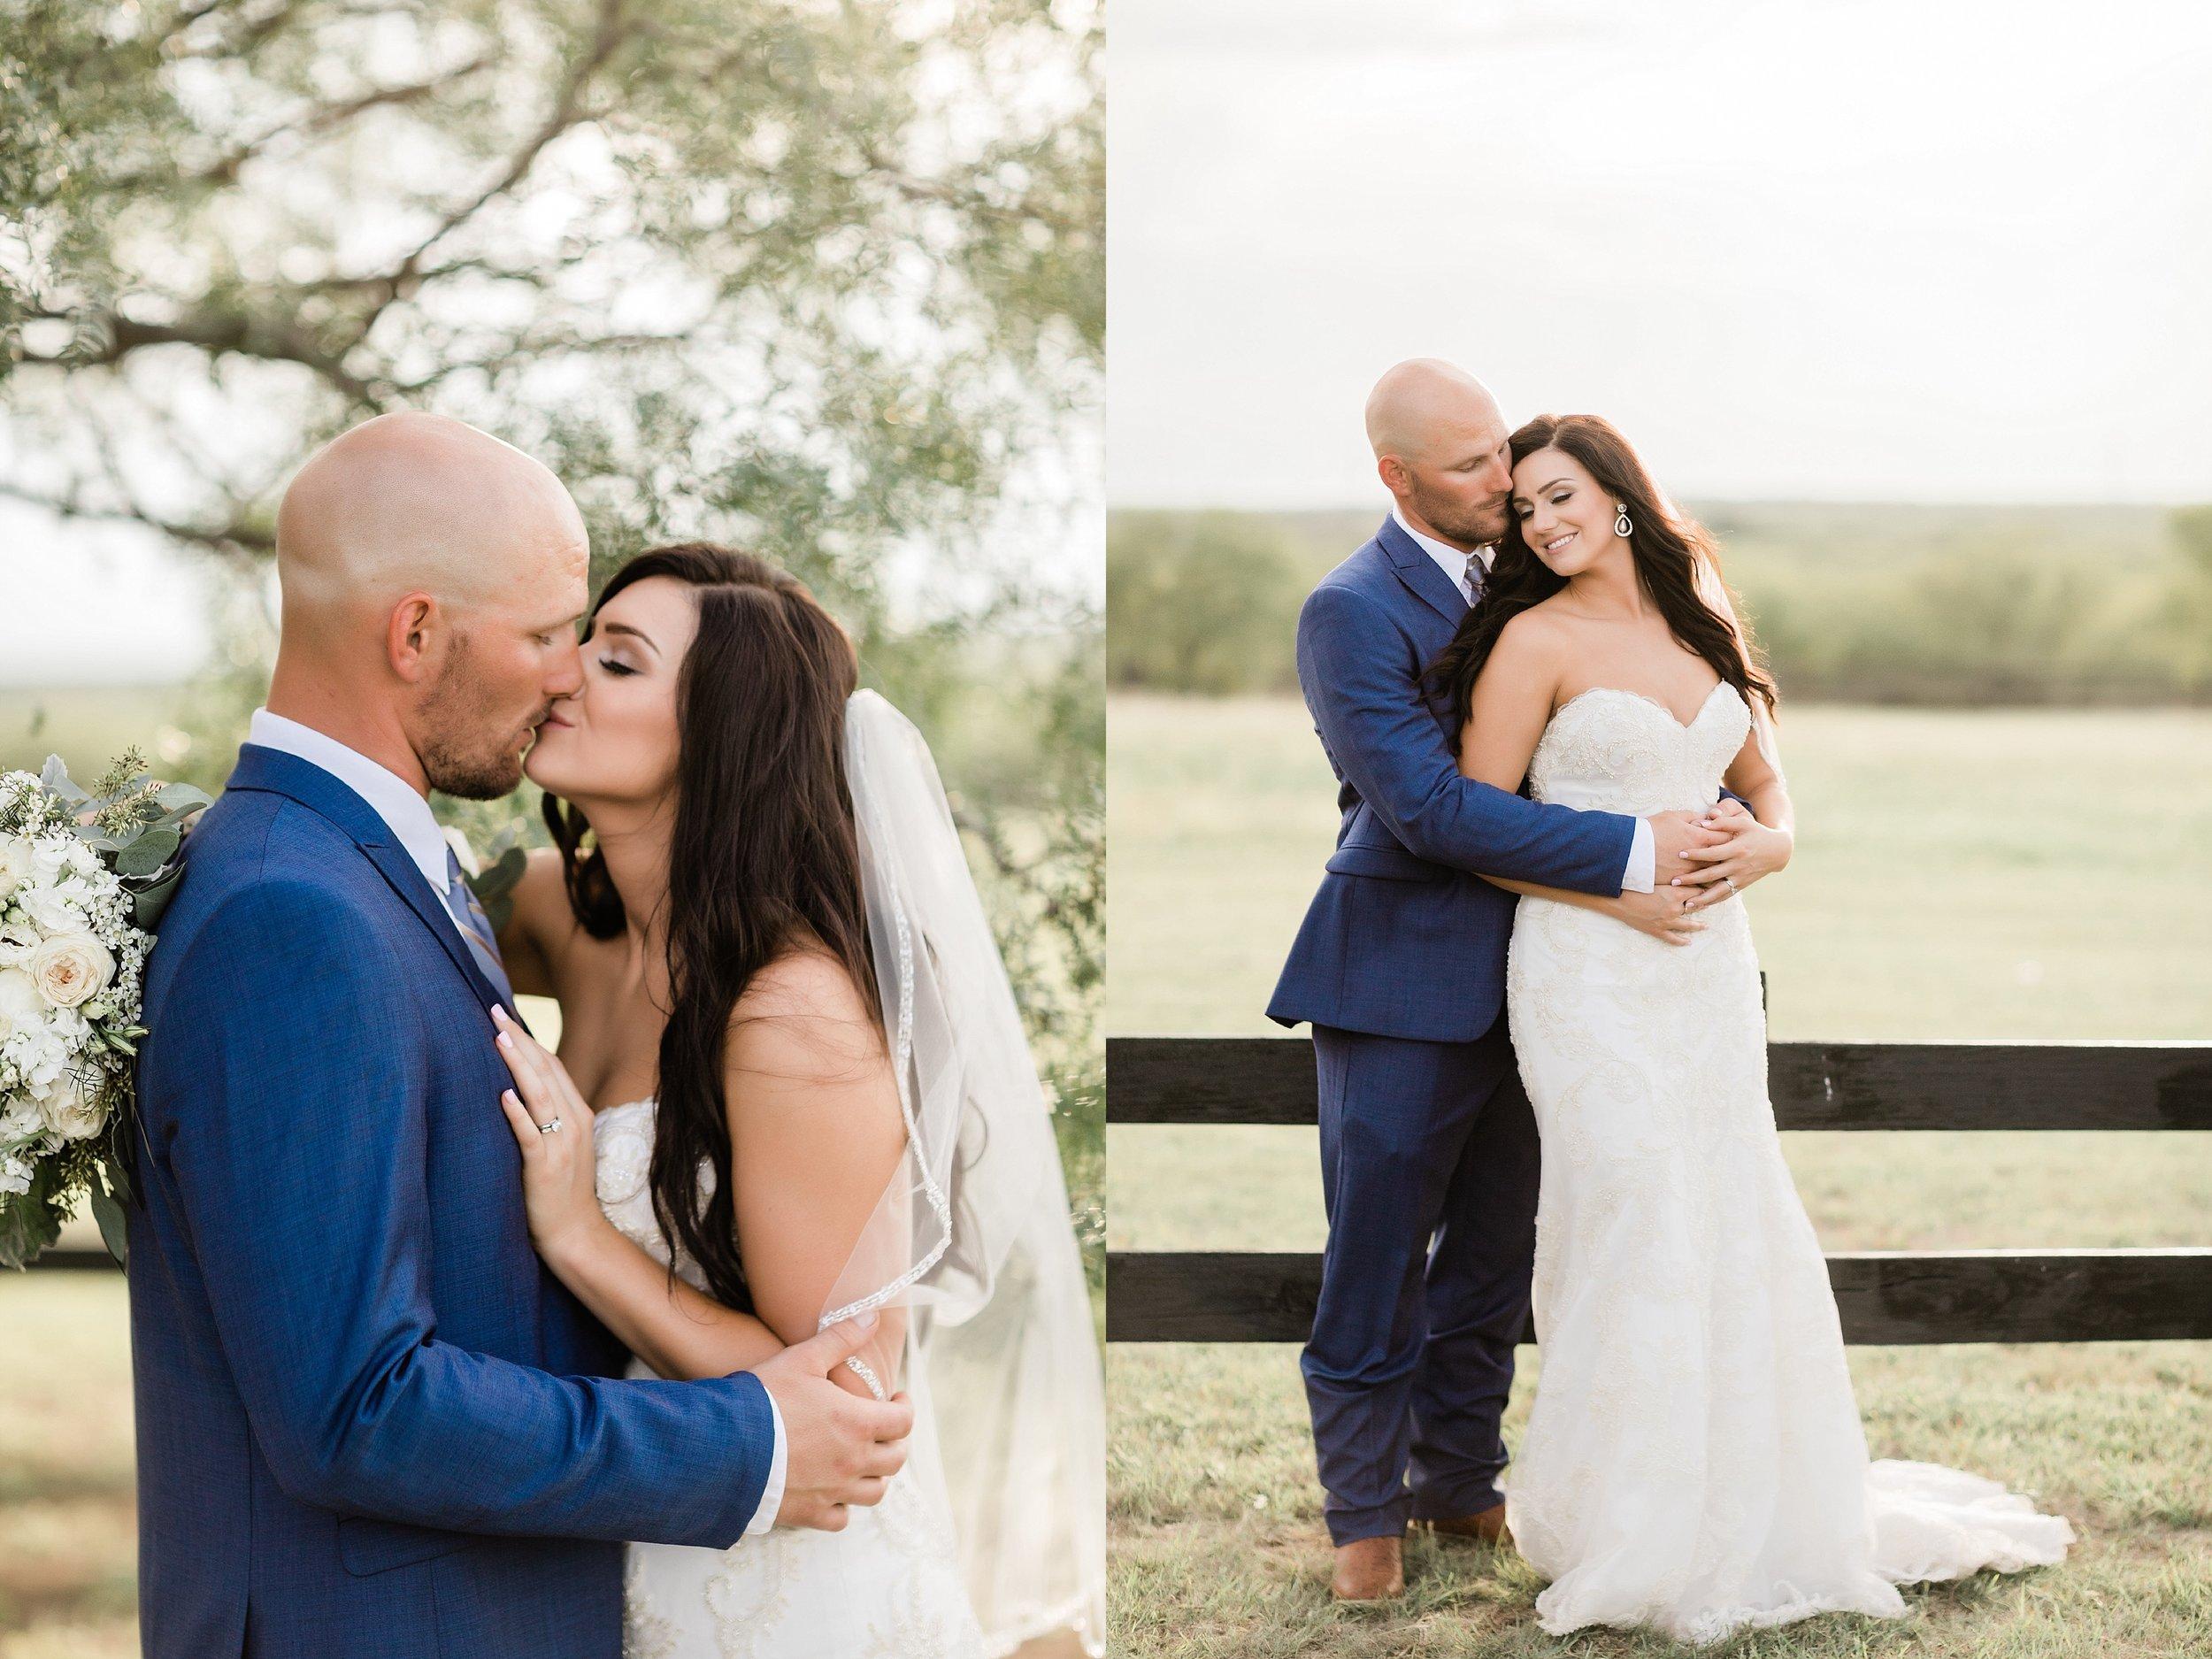 bailey-and-carl-coyote-ranch-resort-wedding-photographer-wichita-falls-texas-destination-wedding-0044.jpg